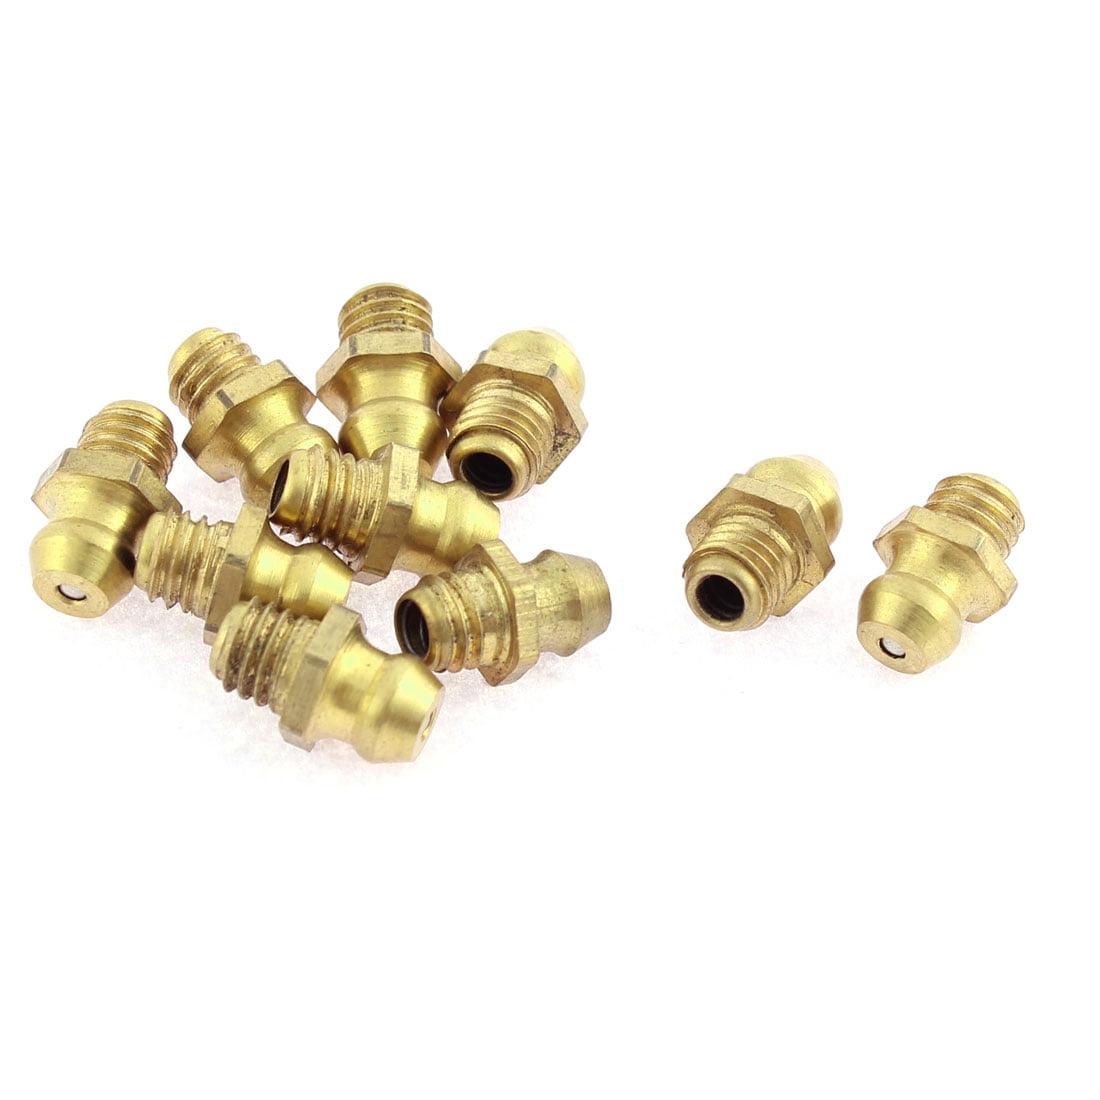 Unique BargainsGold Tone Brass 6mm Male Thread Straight Hydraulic Grease Nipple 10 Pcs